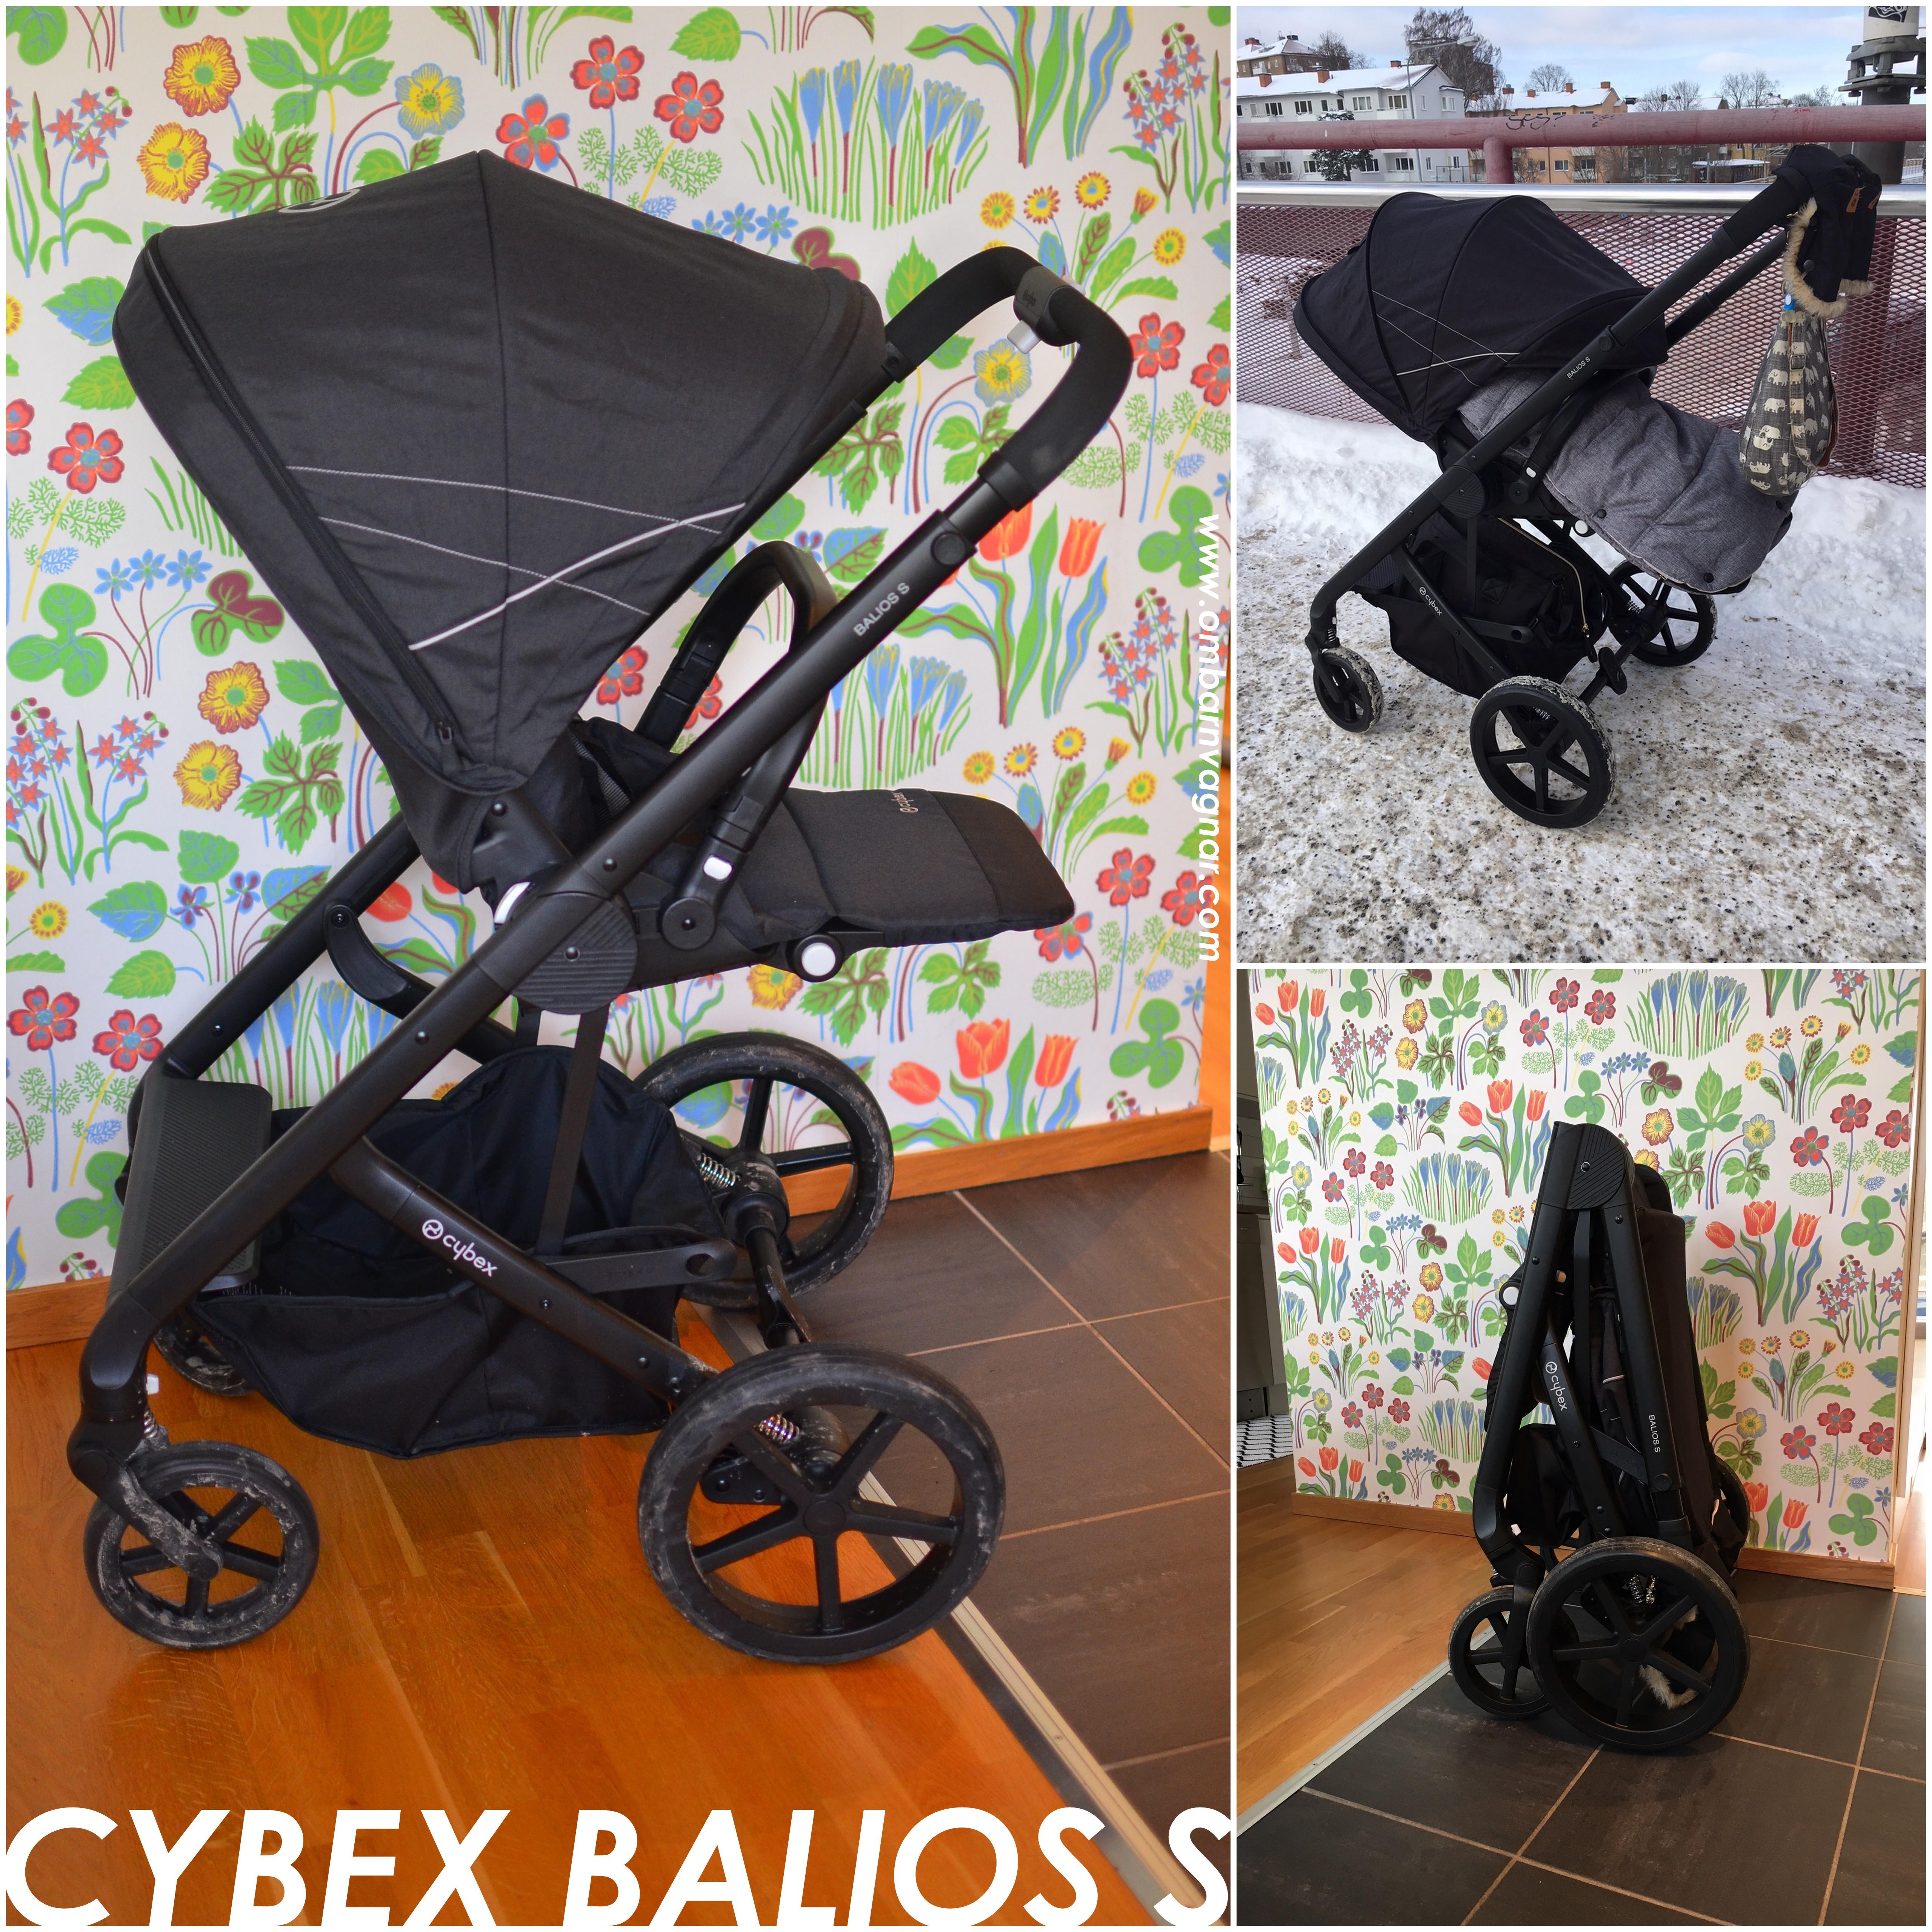 Cybex Balios S kom år 2018